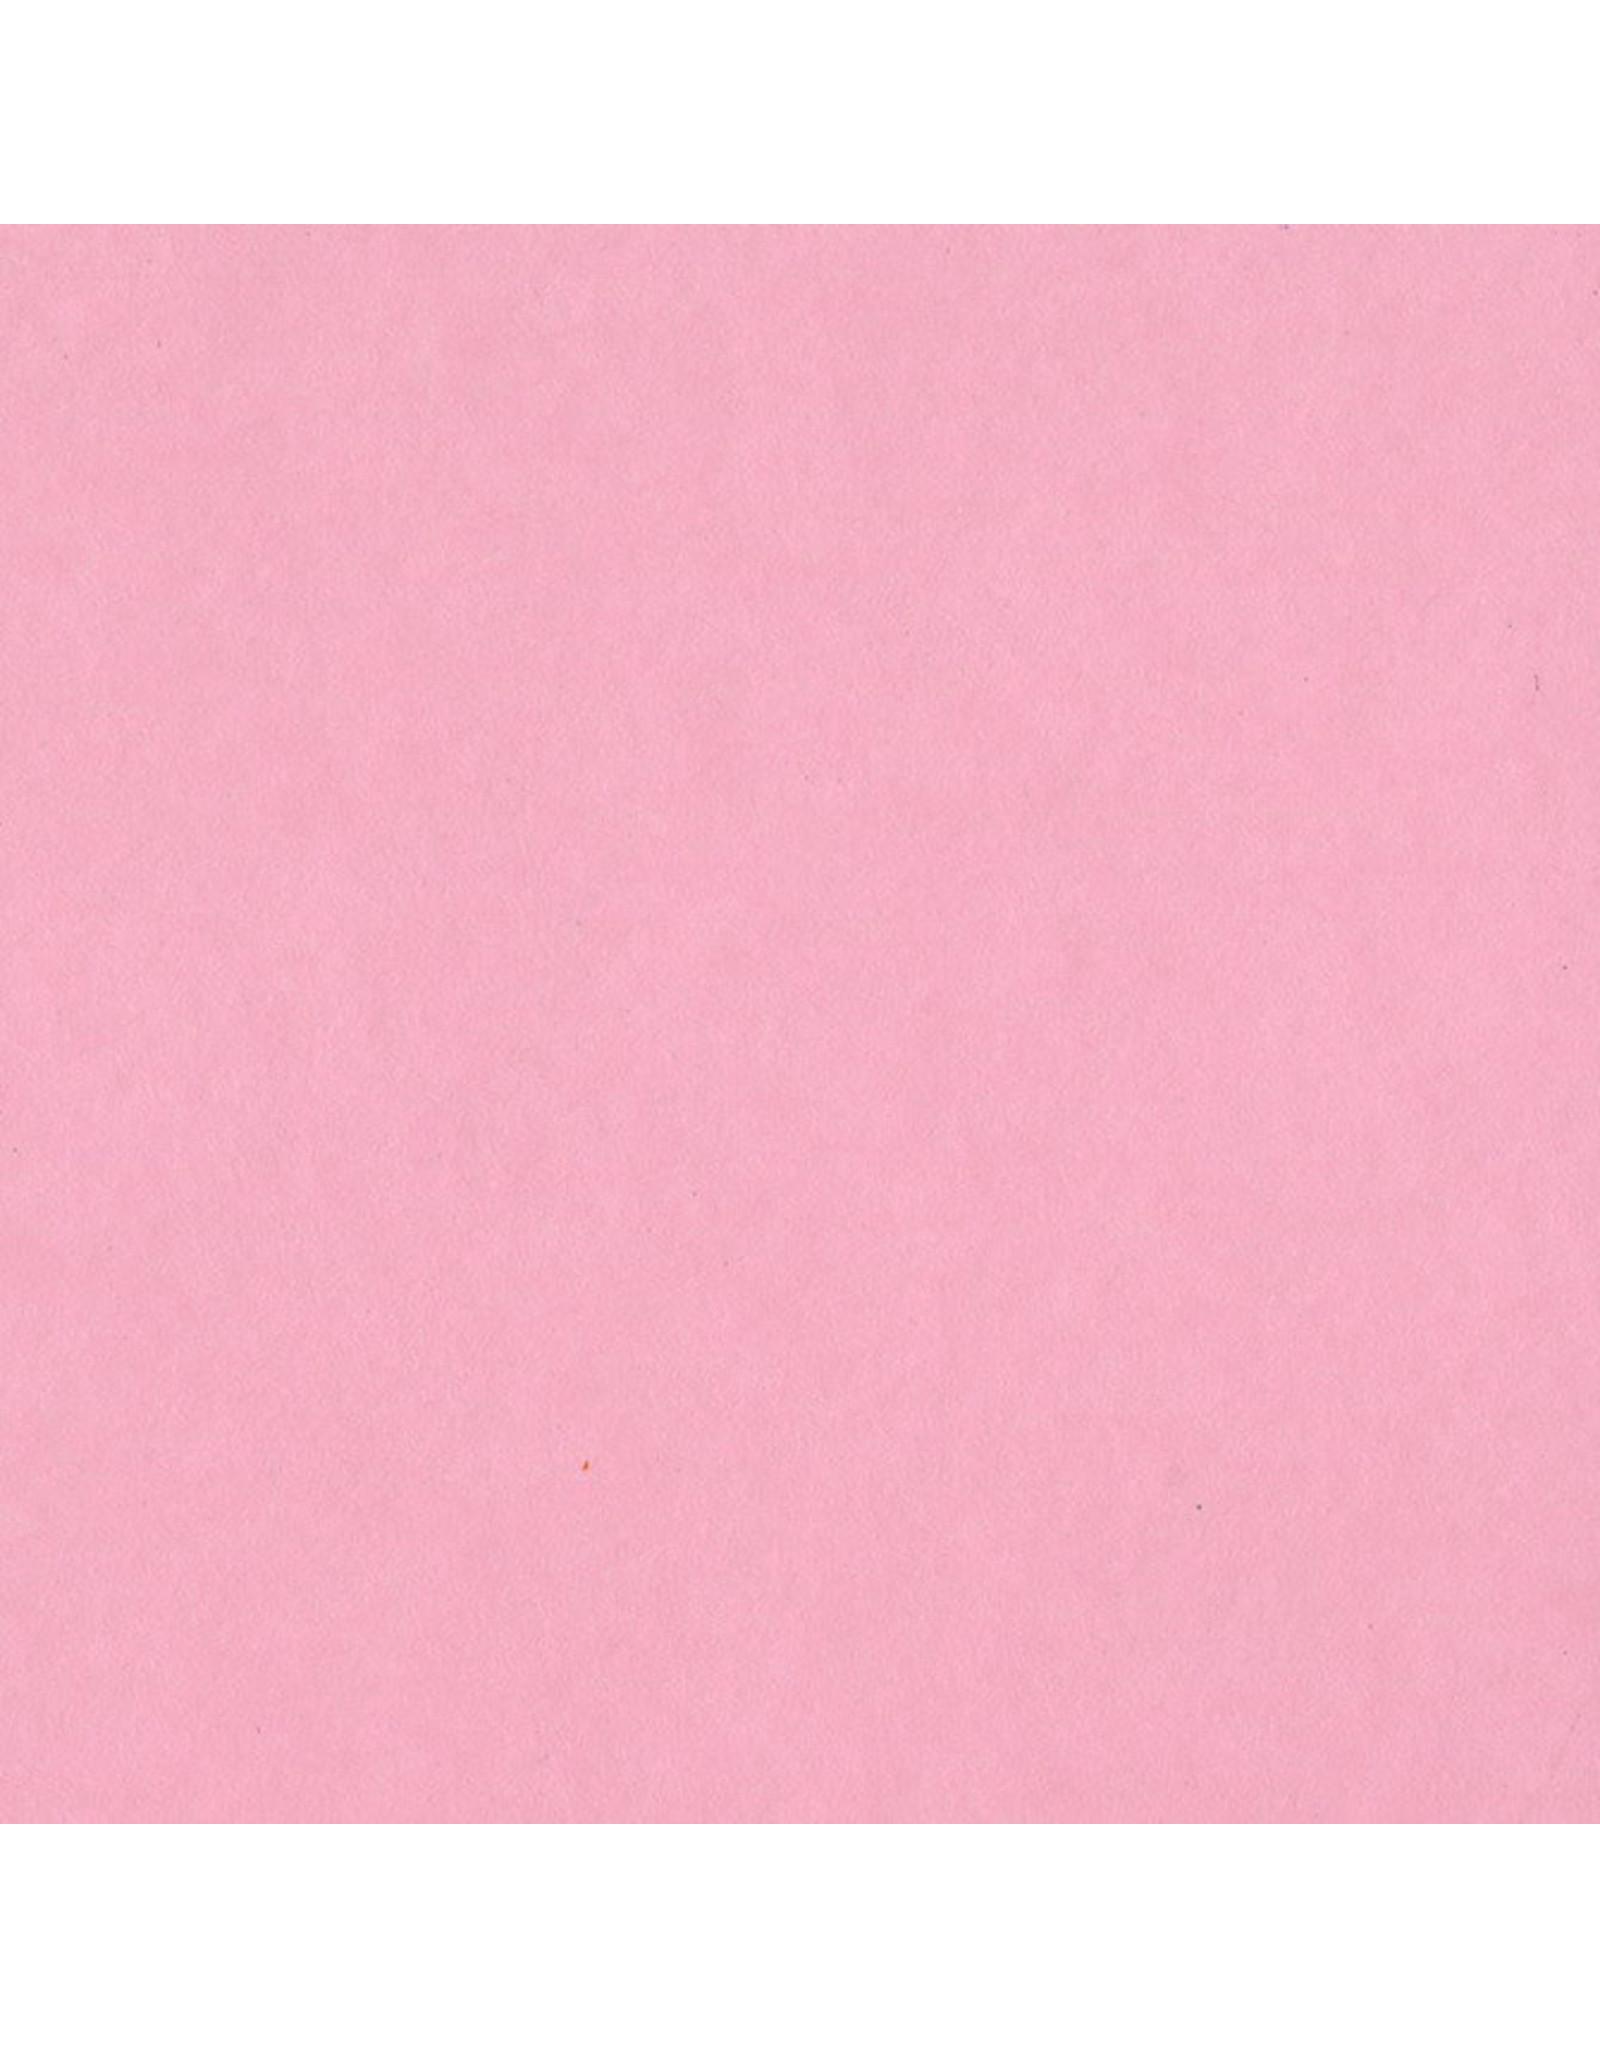 Bazzill Bazzill Card Shoppe 8.5x11 - Cotton Candy